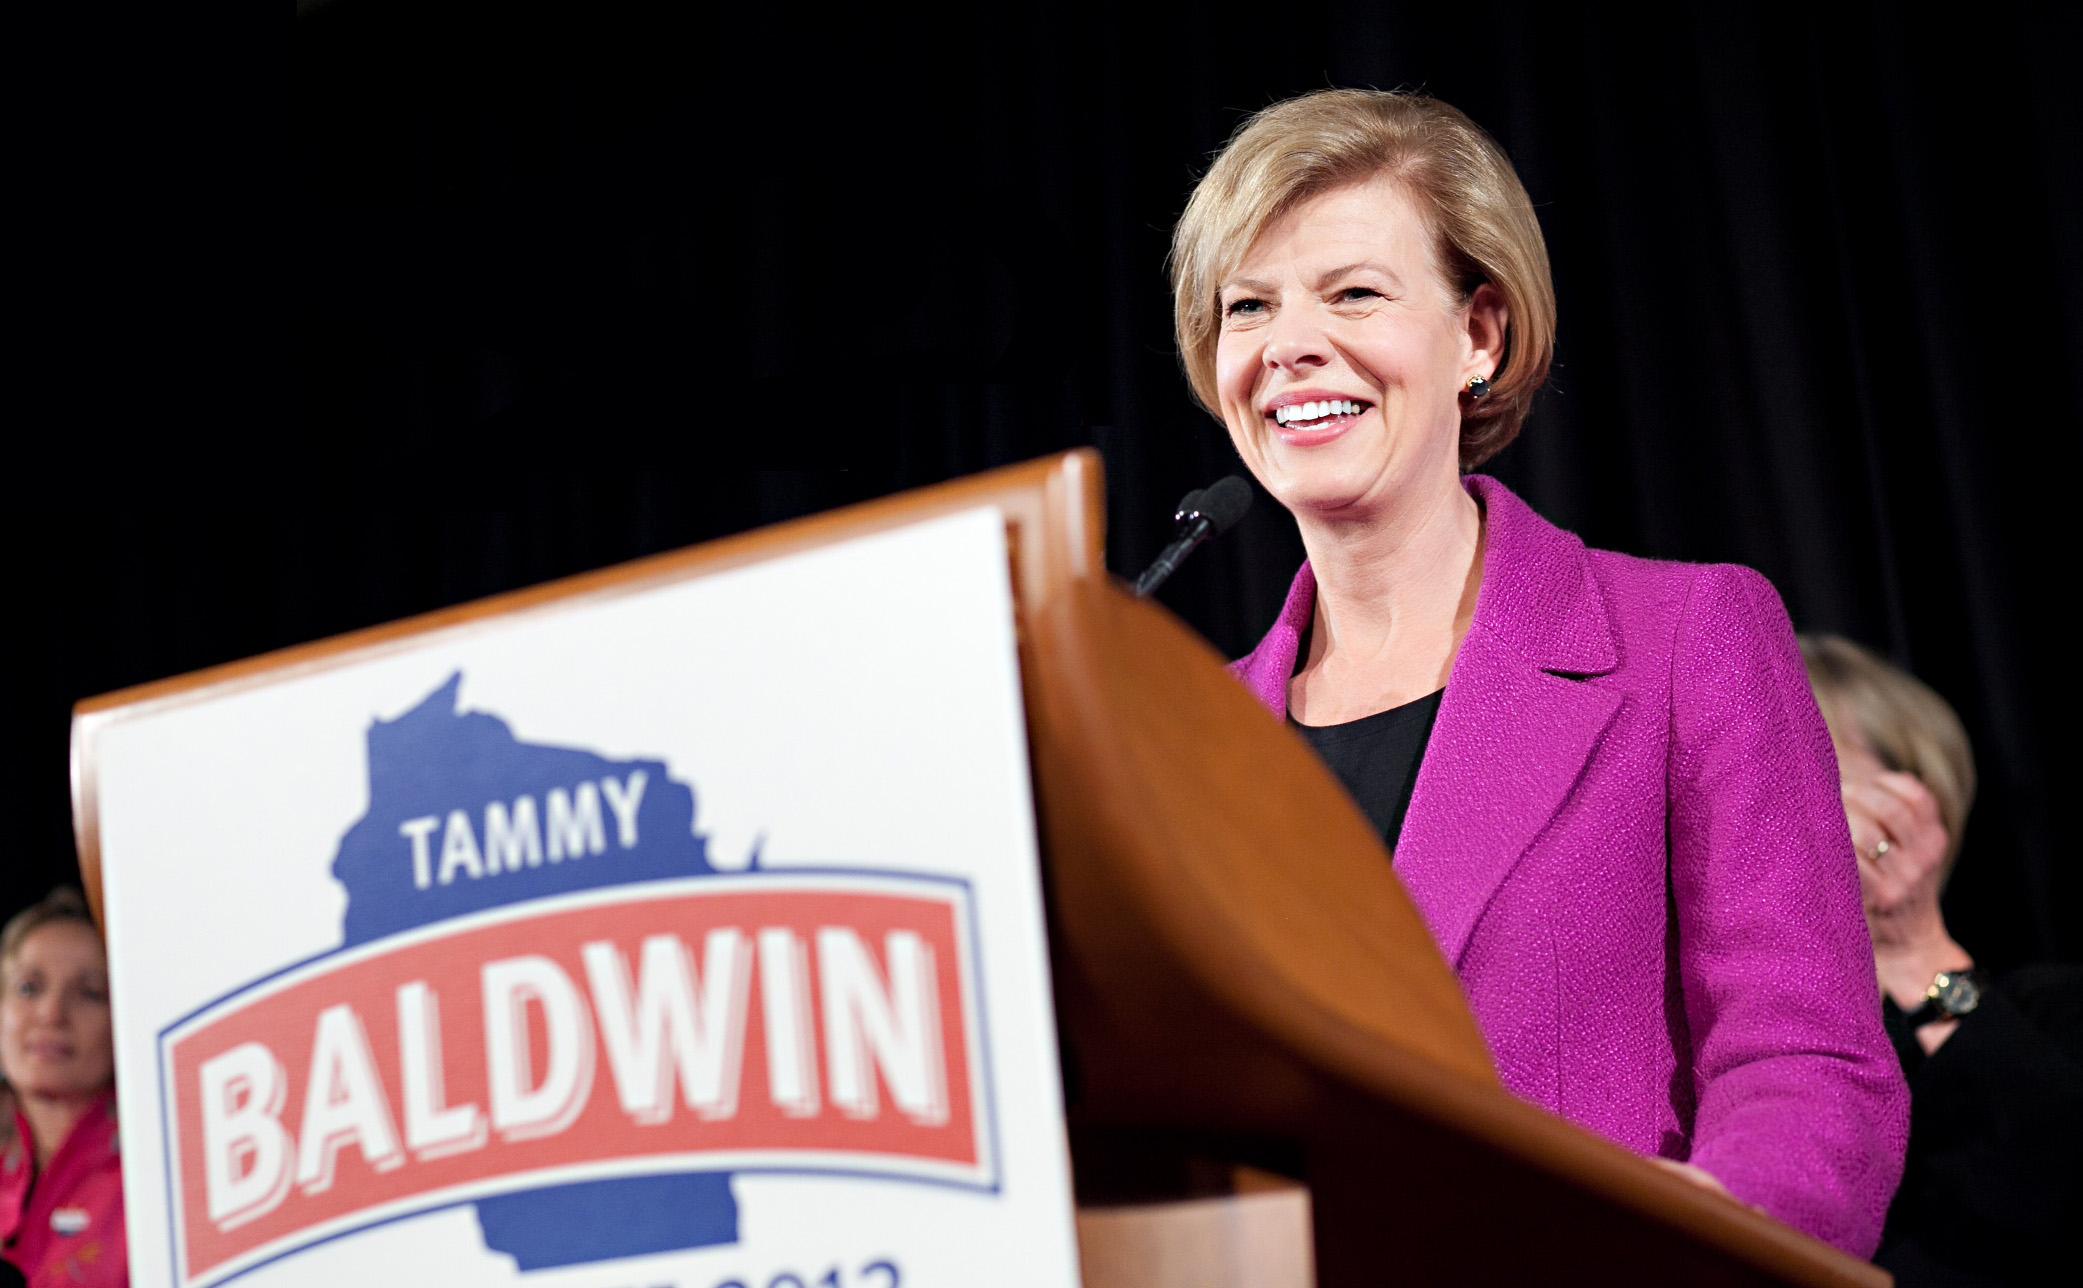 Baldwin on election night in 2012.